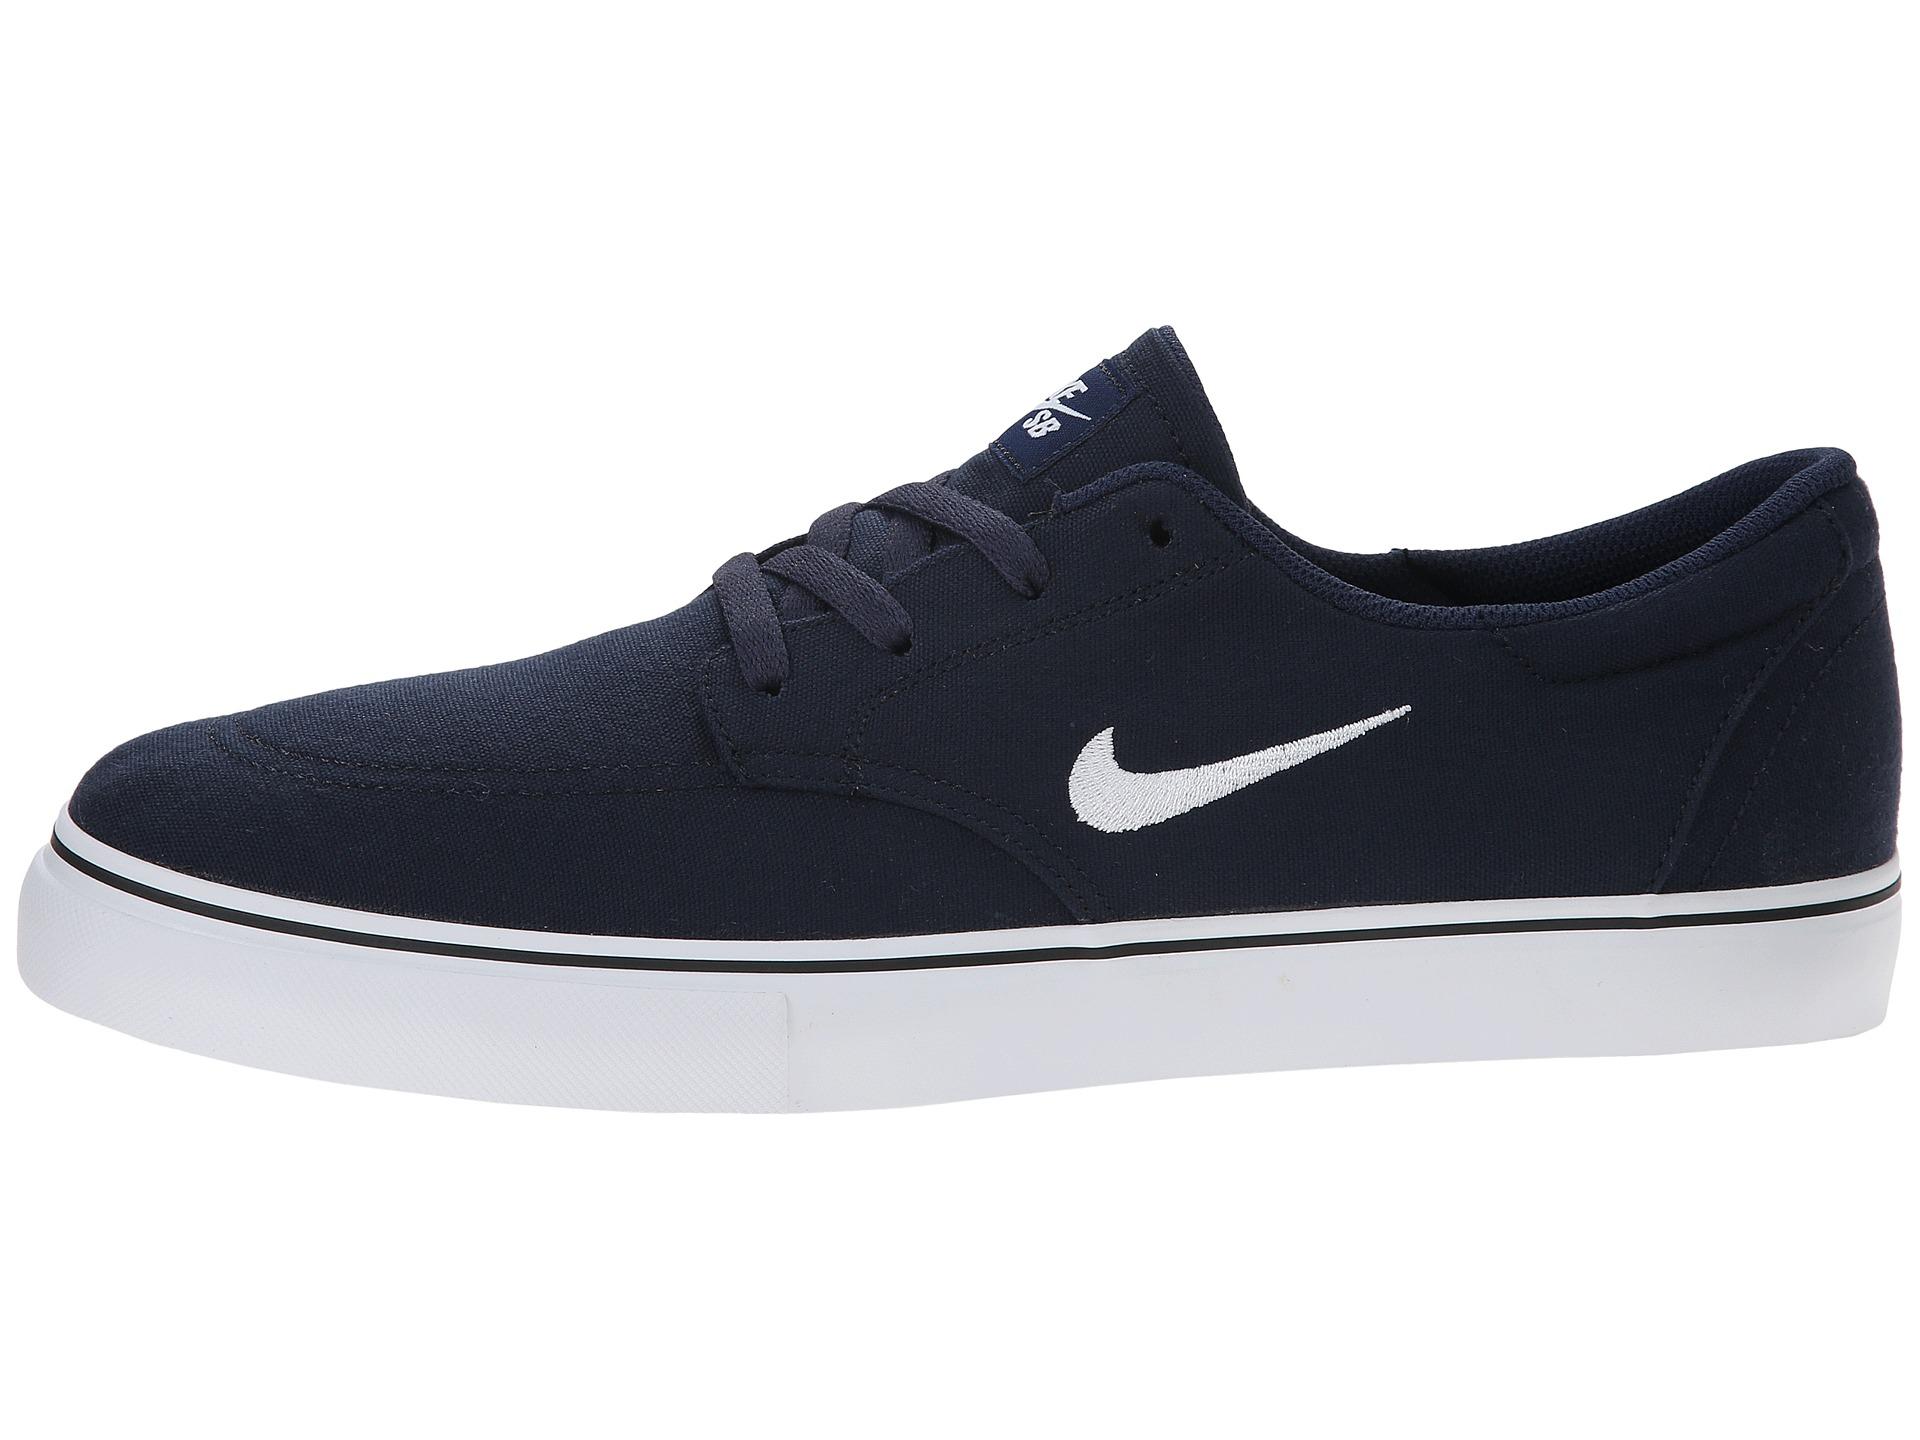 Nike Clutch Skate Shoe